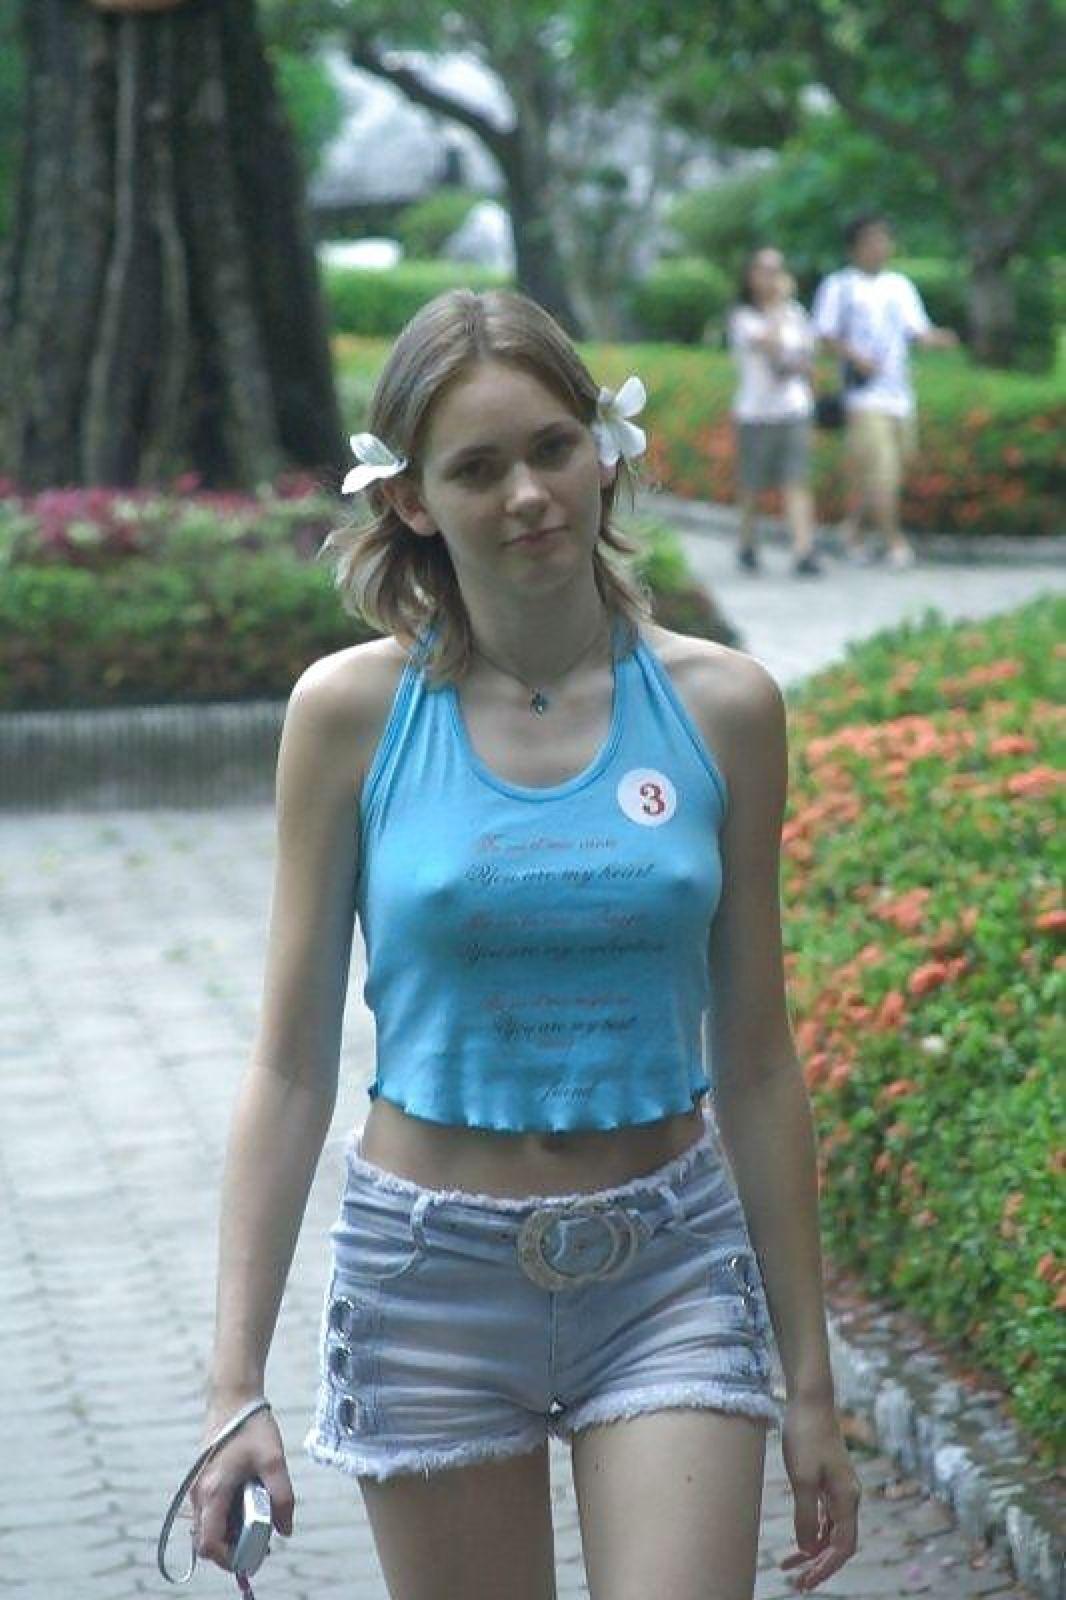 young pokies images - usseek.com